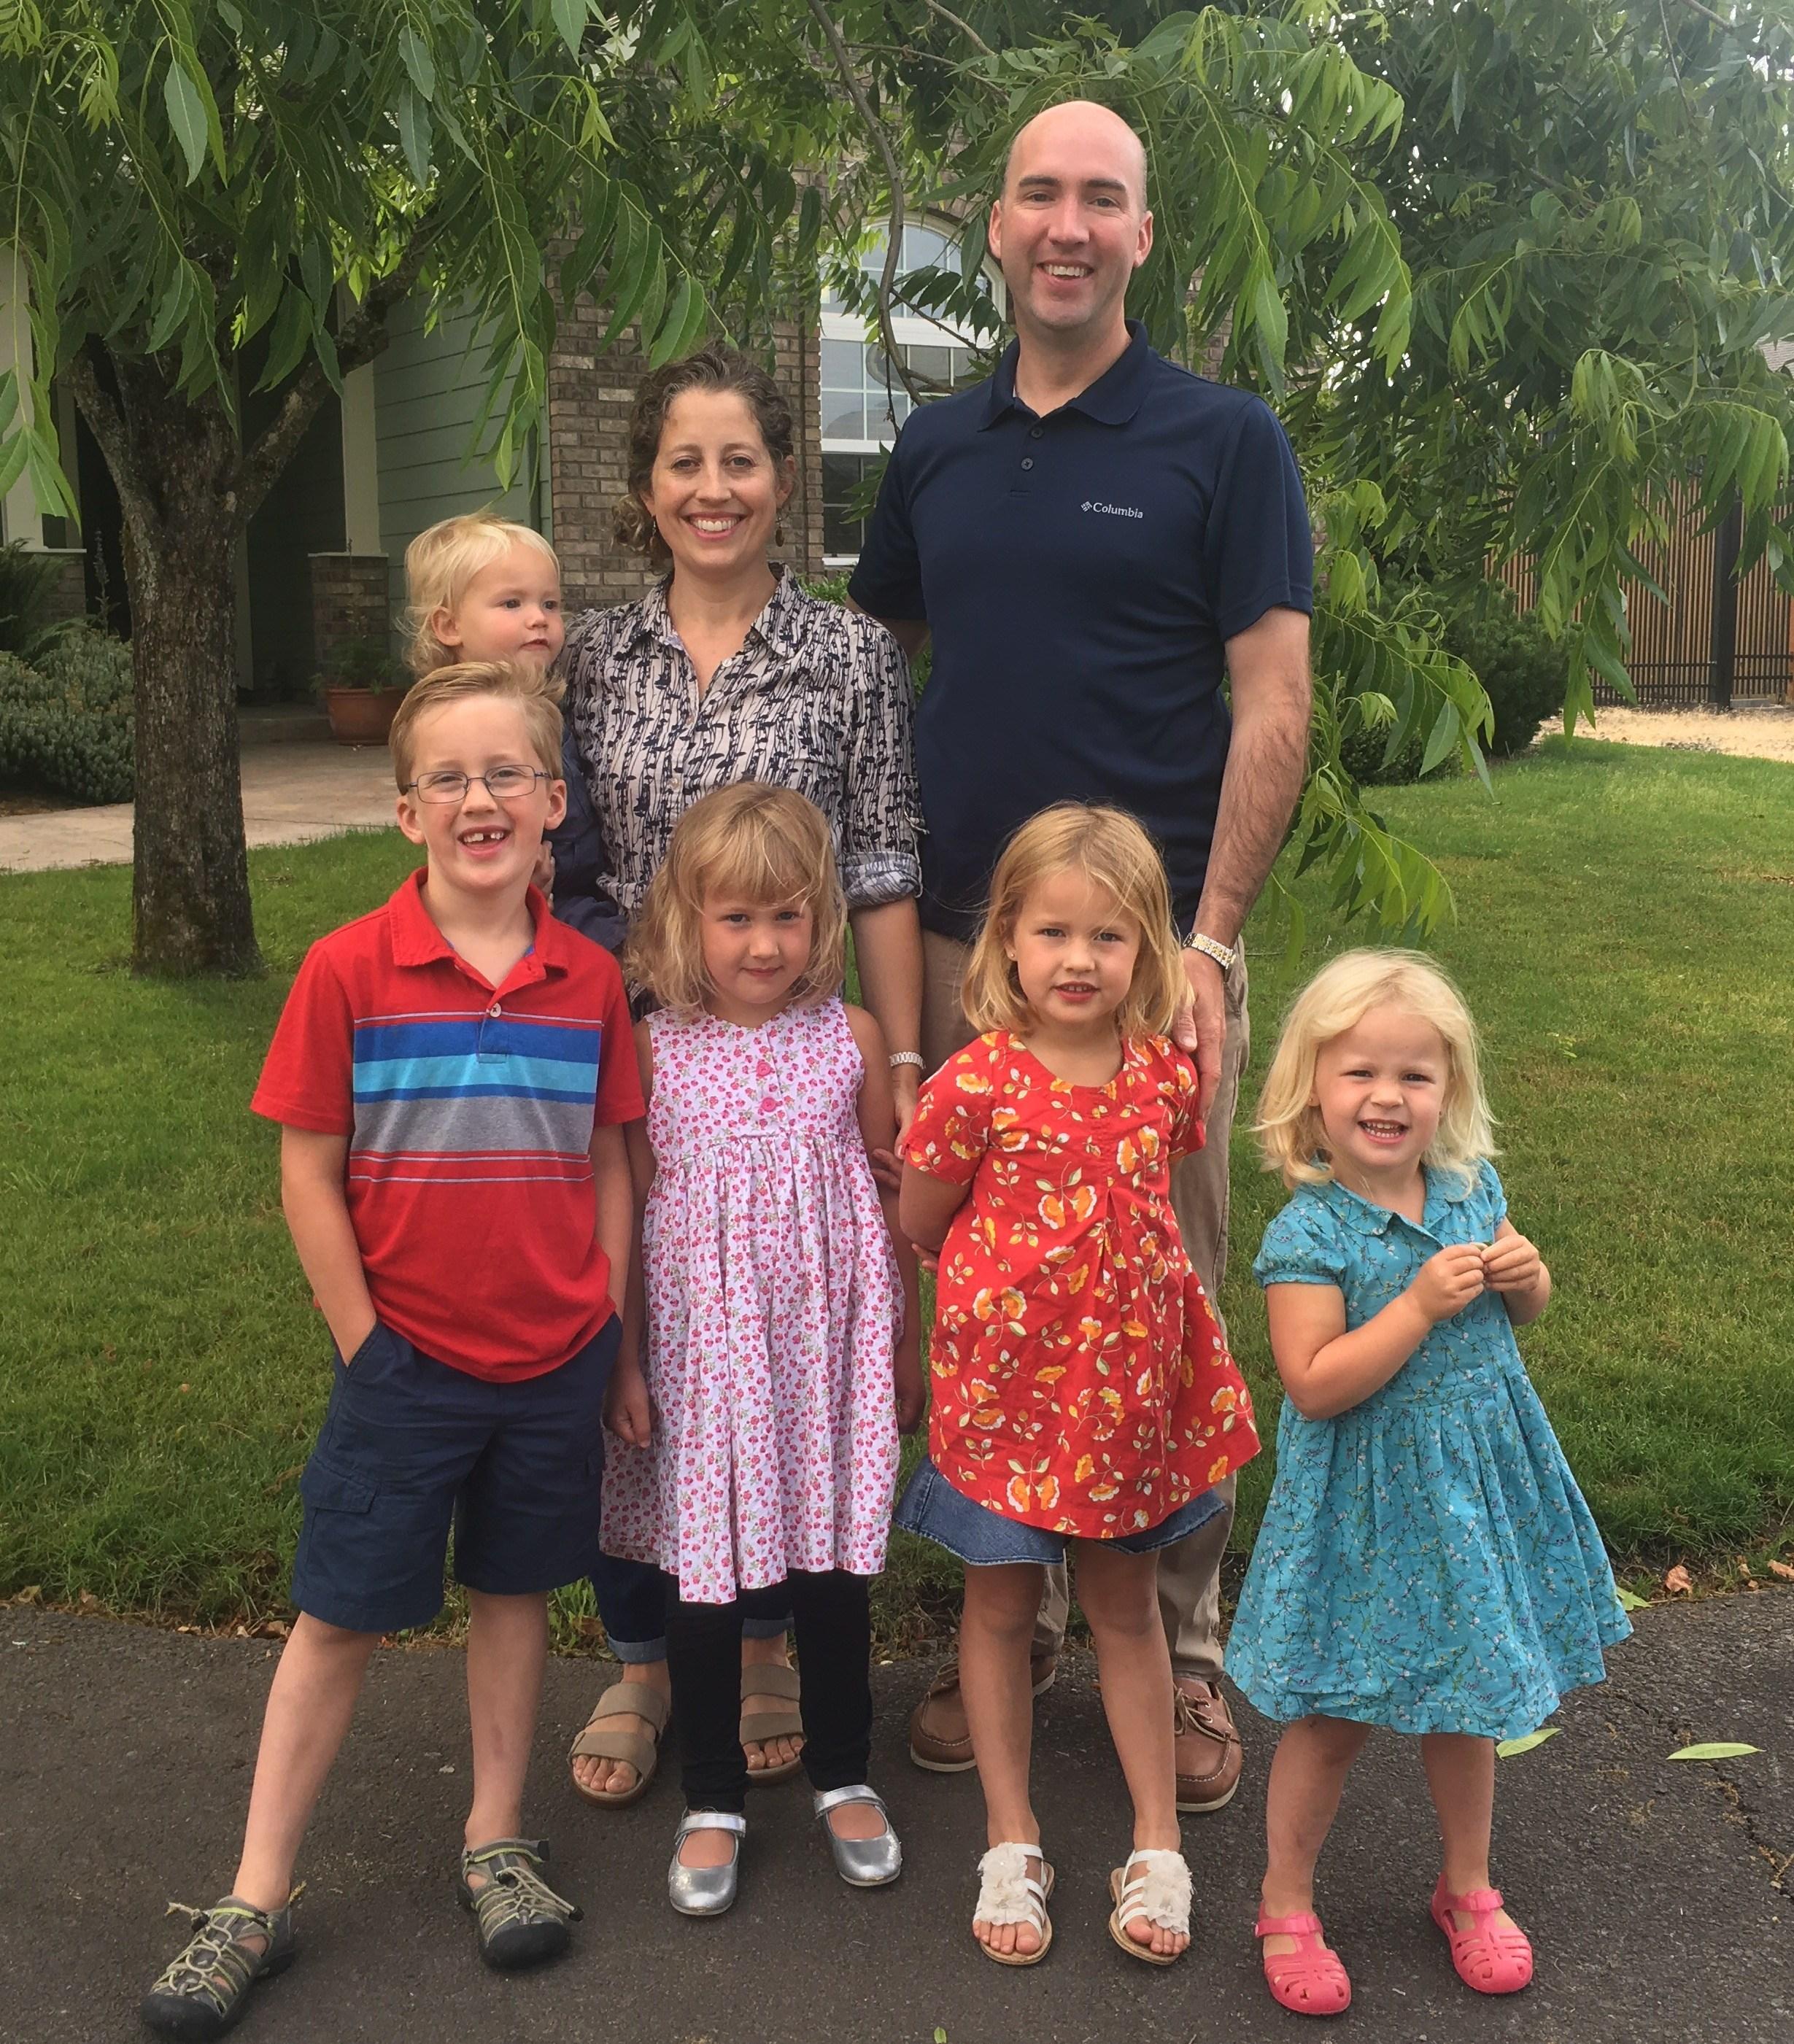 family-photo-for-intake-2018.jpg